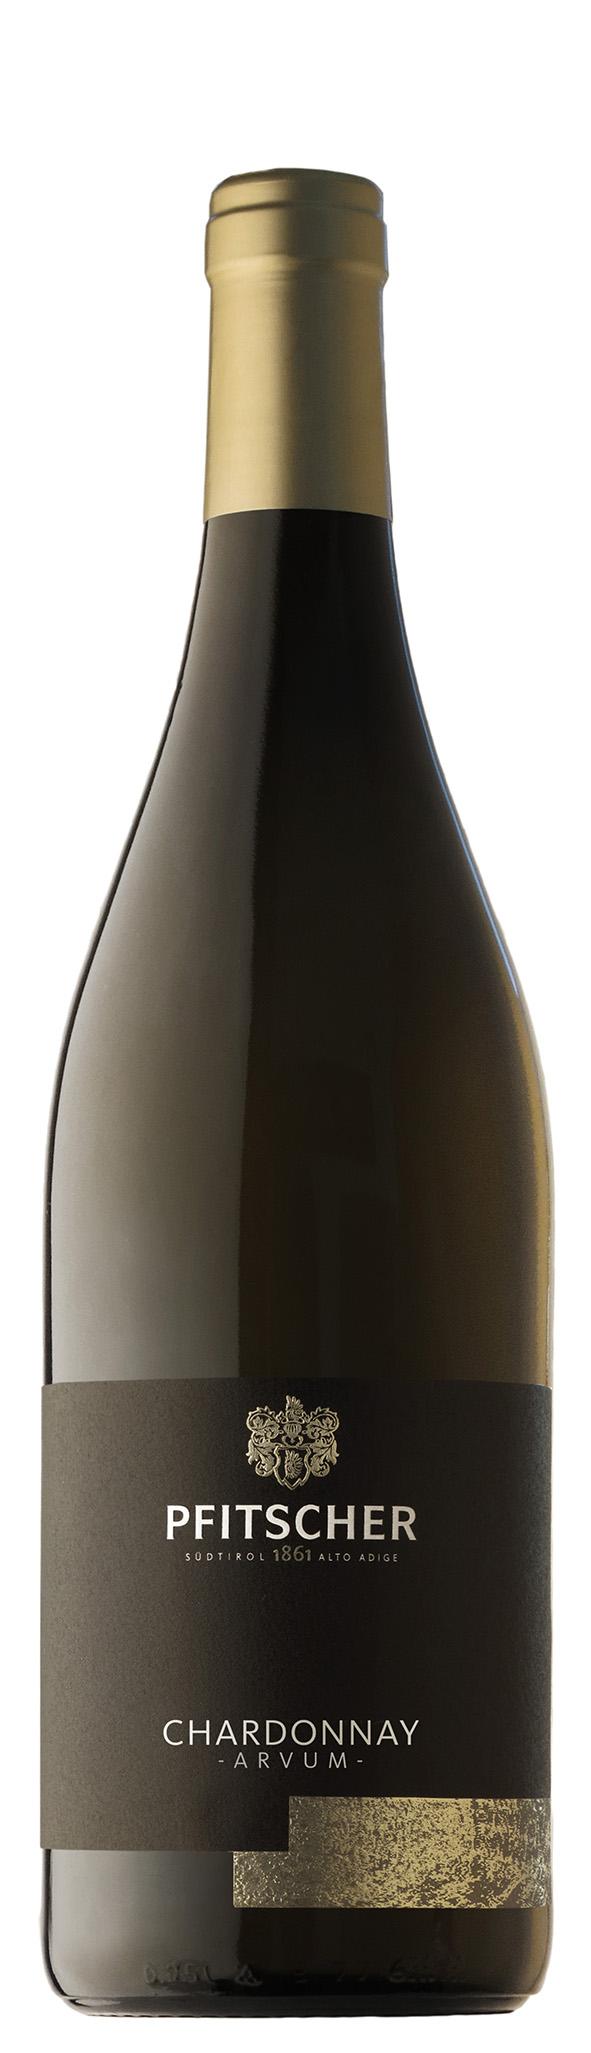 Chardonnay Arvum